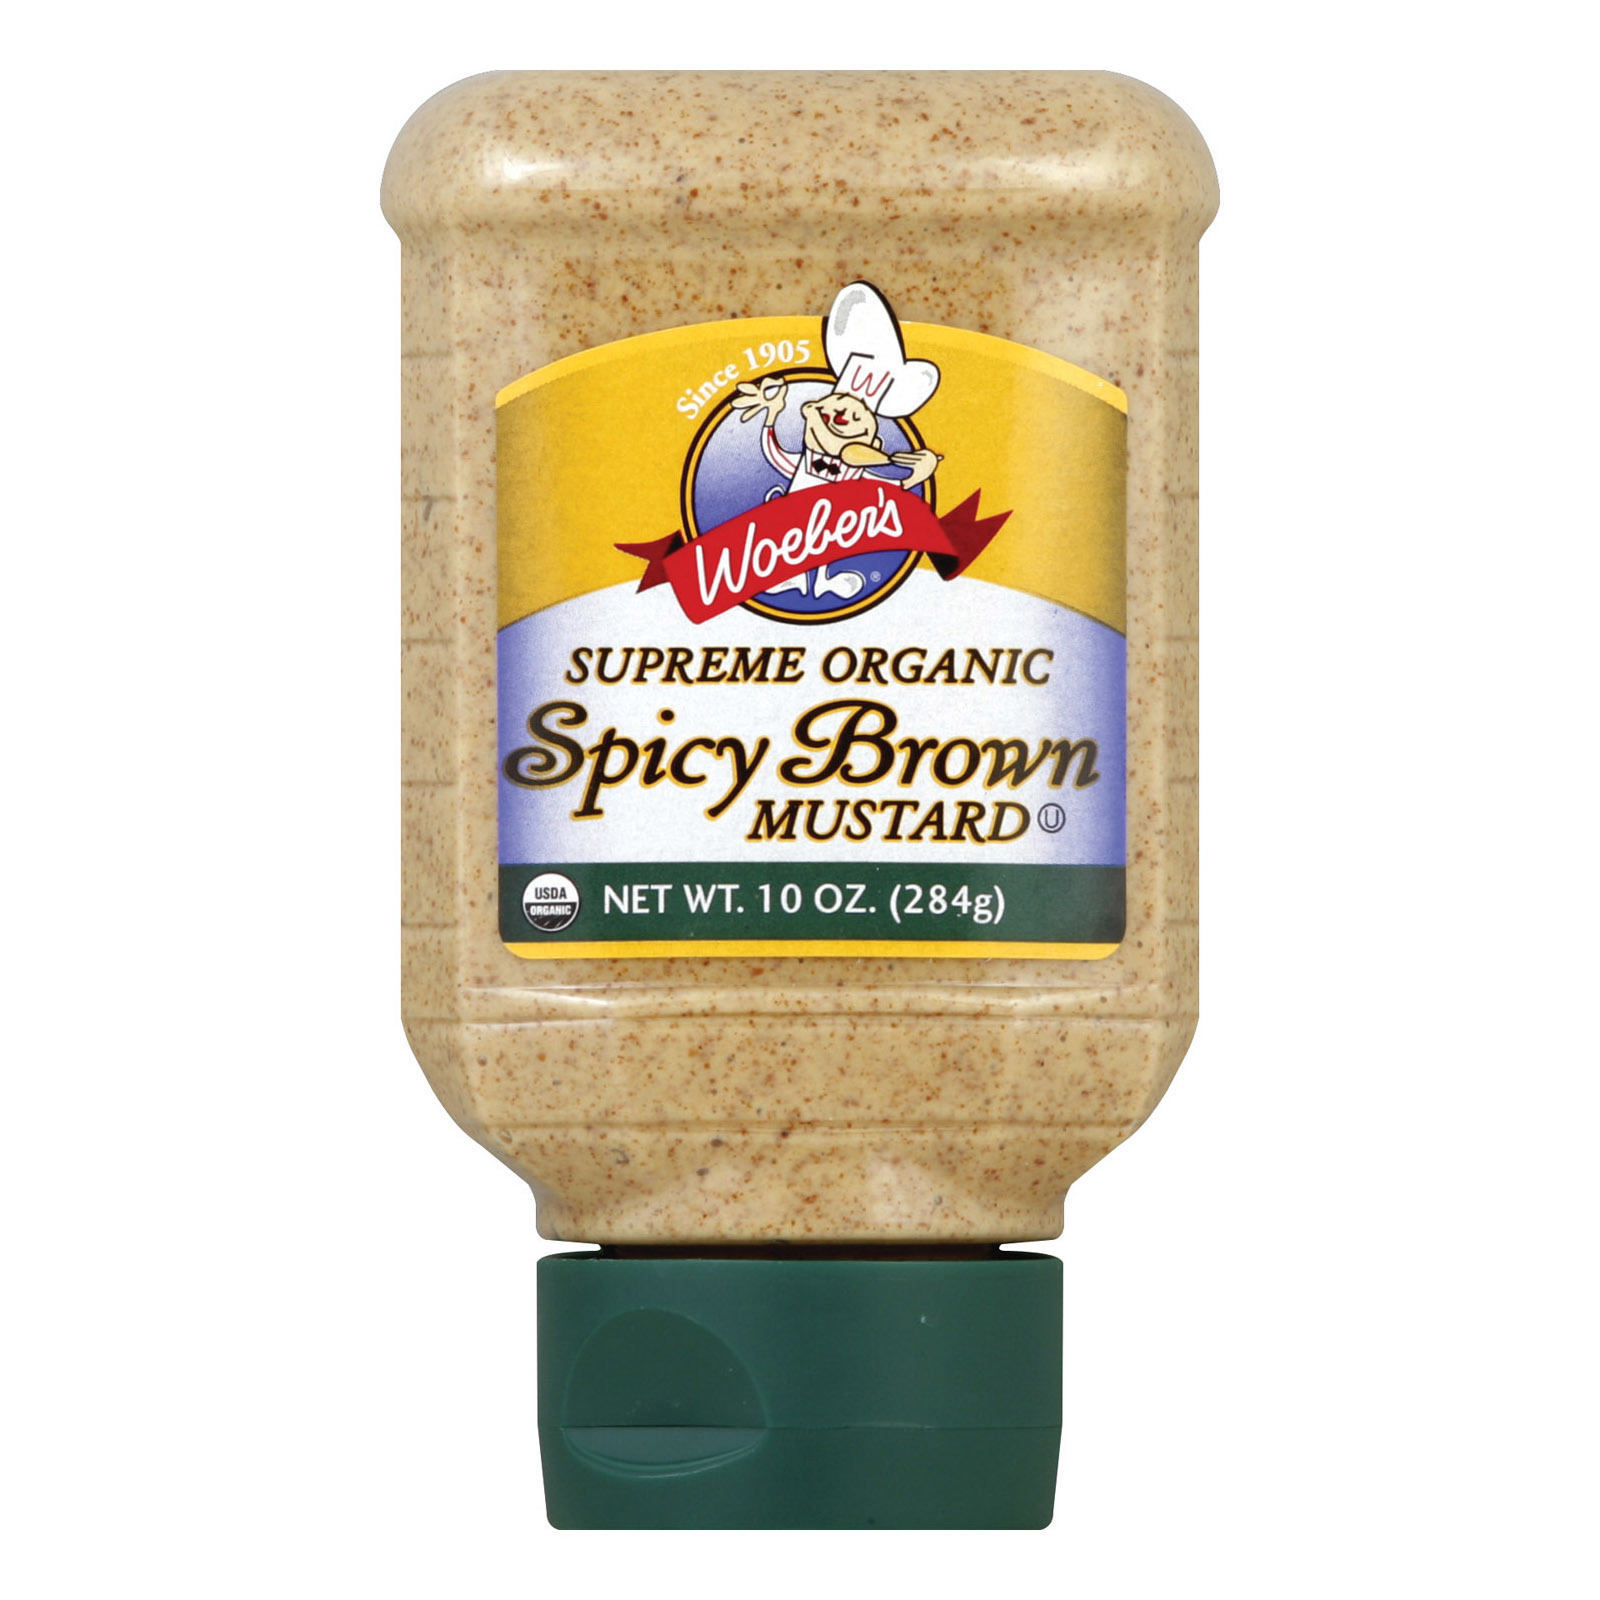 Woeber's Supreme Organic Spicy Brown Mustard - Case of 6 - 10 oz.